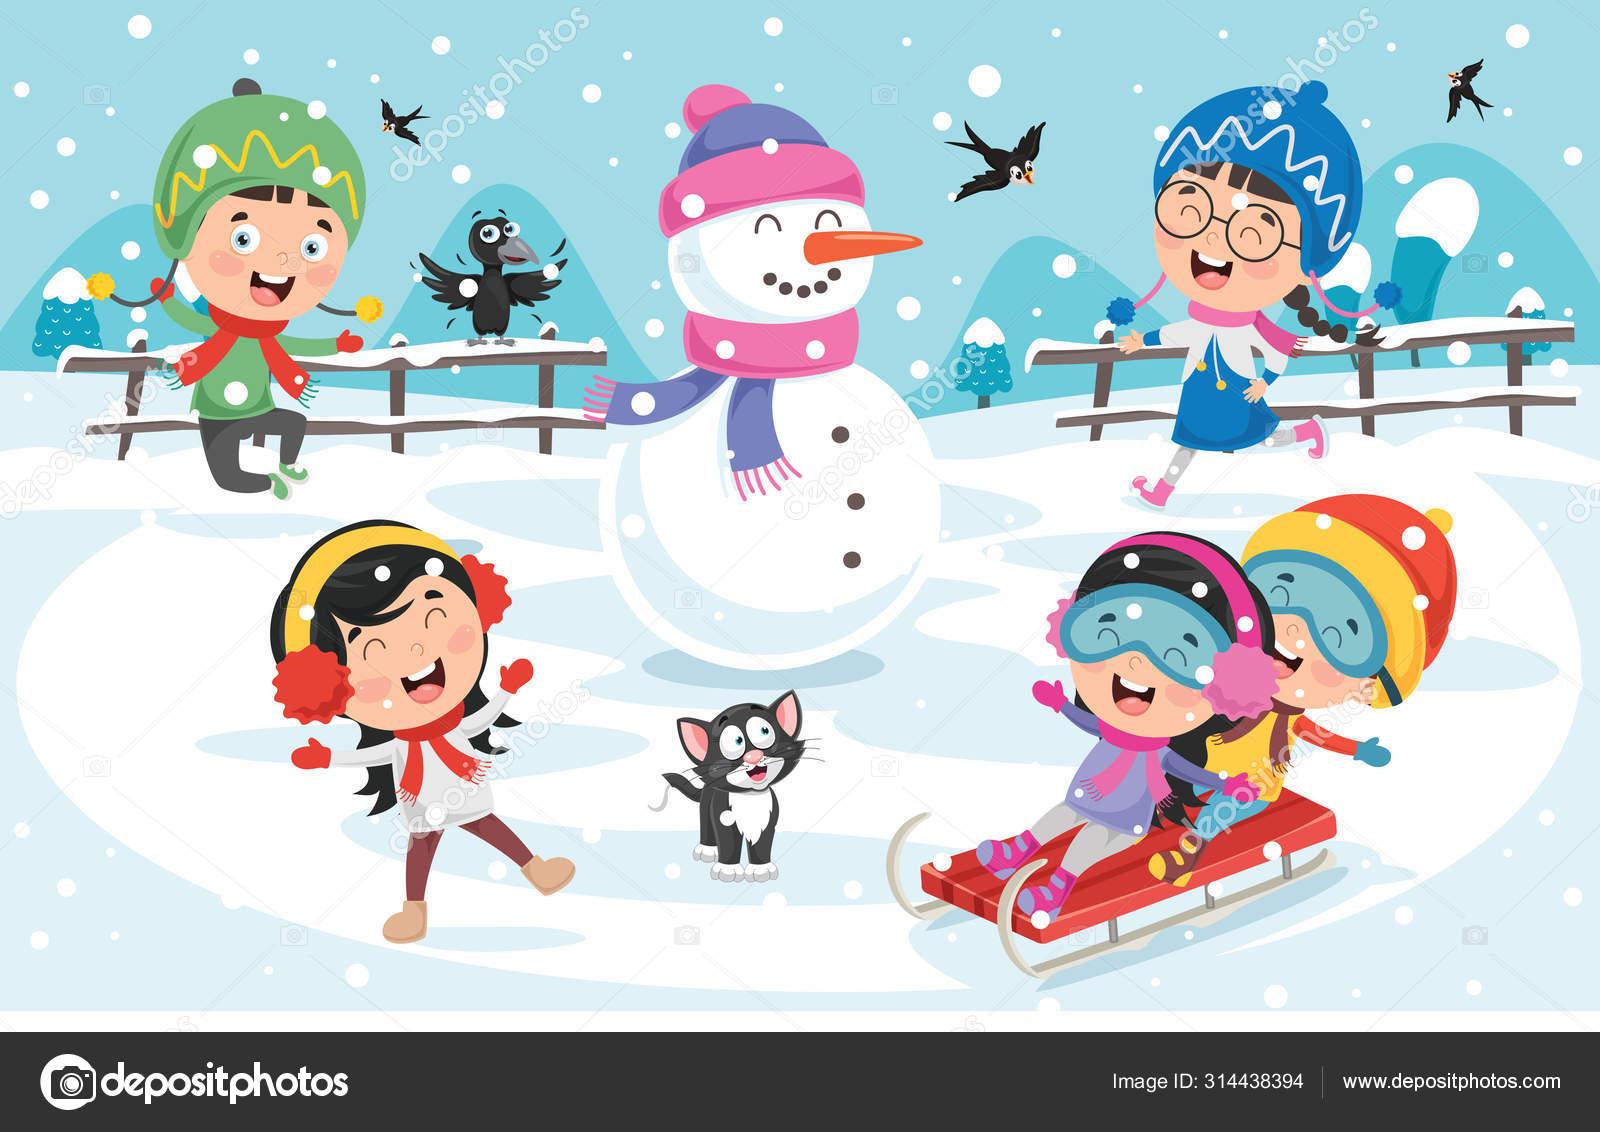 Áˆ Kids Playing Outside Cartoon Stock Vectors Royalty Free Kids Playing Outside Illustrations Download On Depositphotos